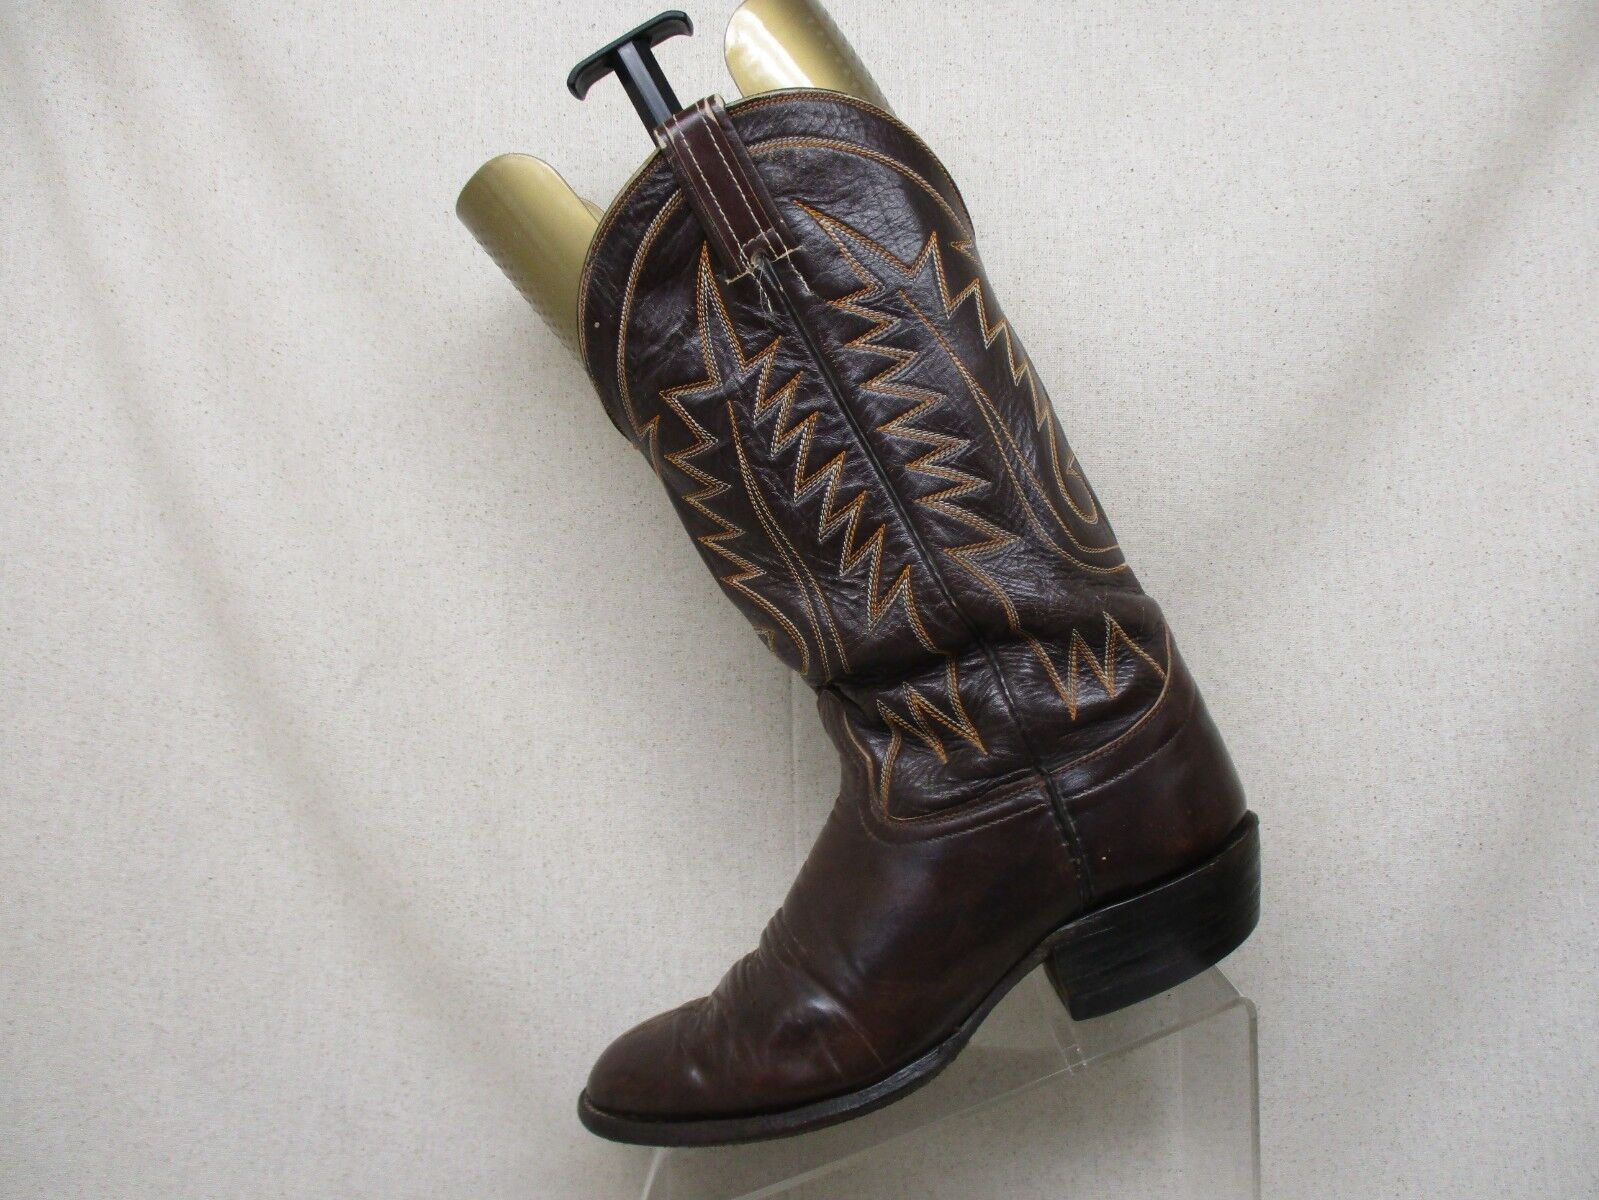 Hondo Marrone Leather Pull Pull Pull On Western Cowboy stivali Uomo Dimensione 9D Style 5982 a8b4eb